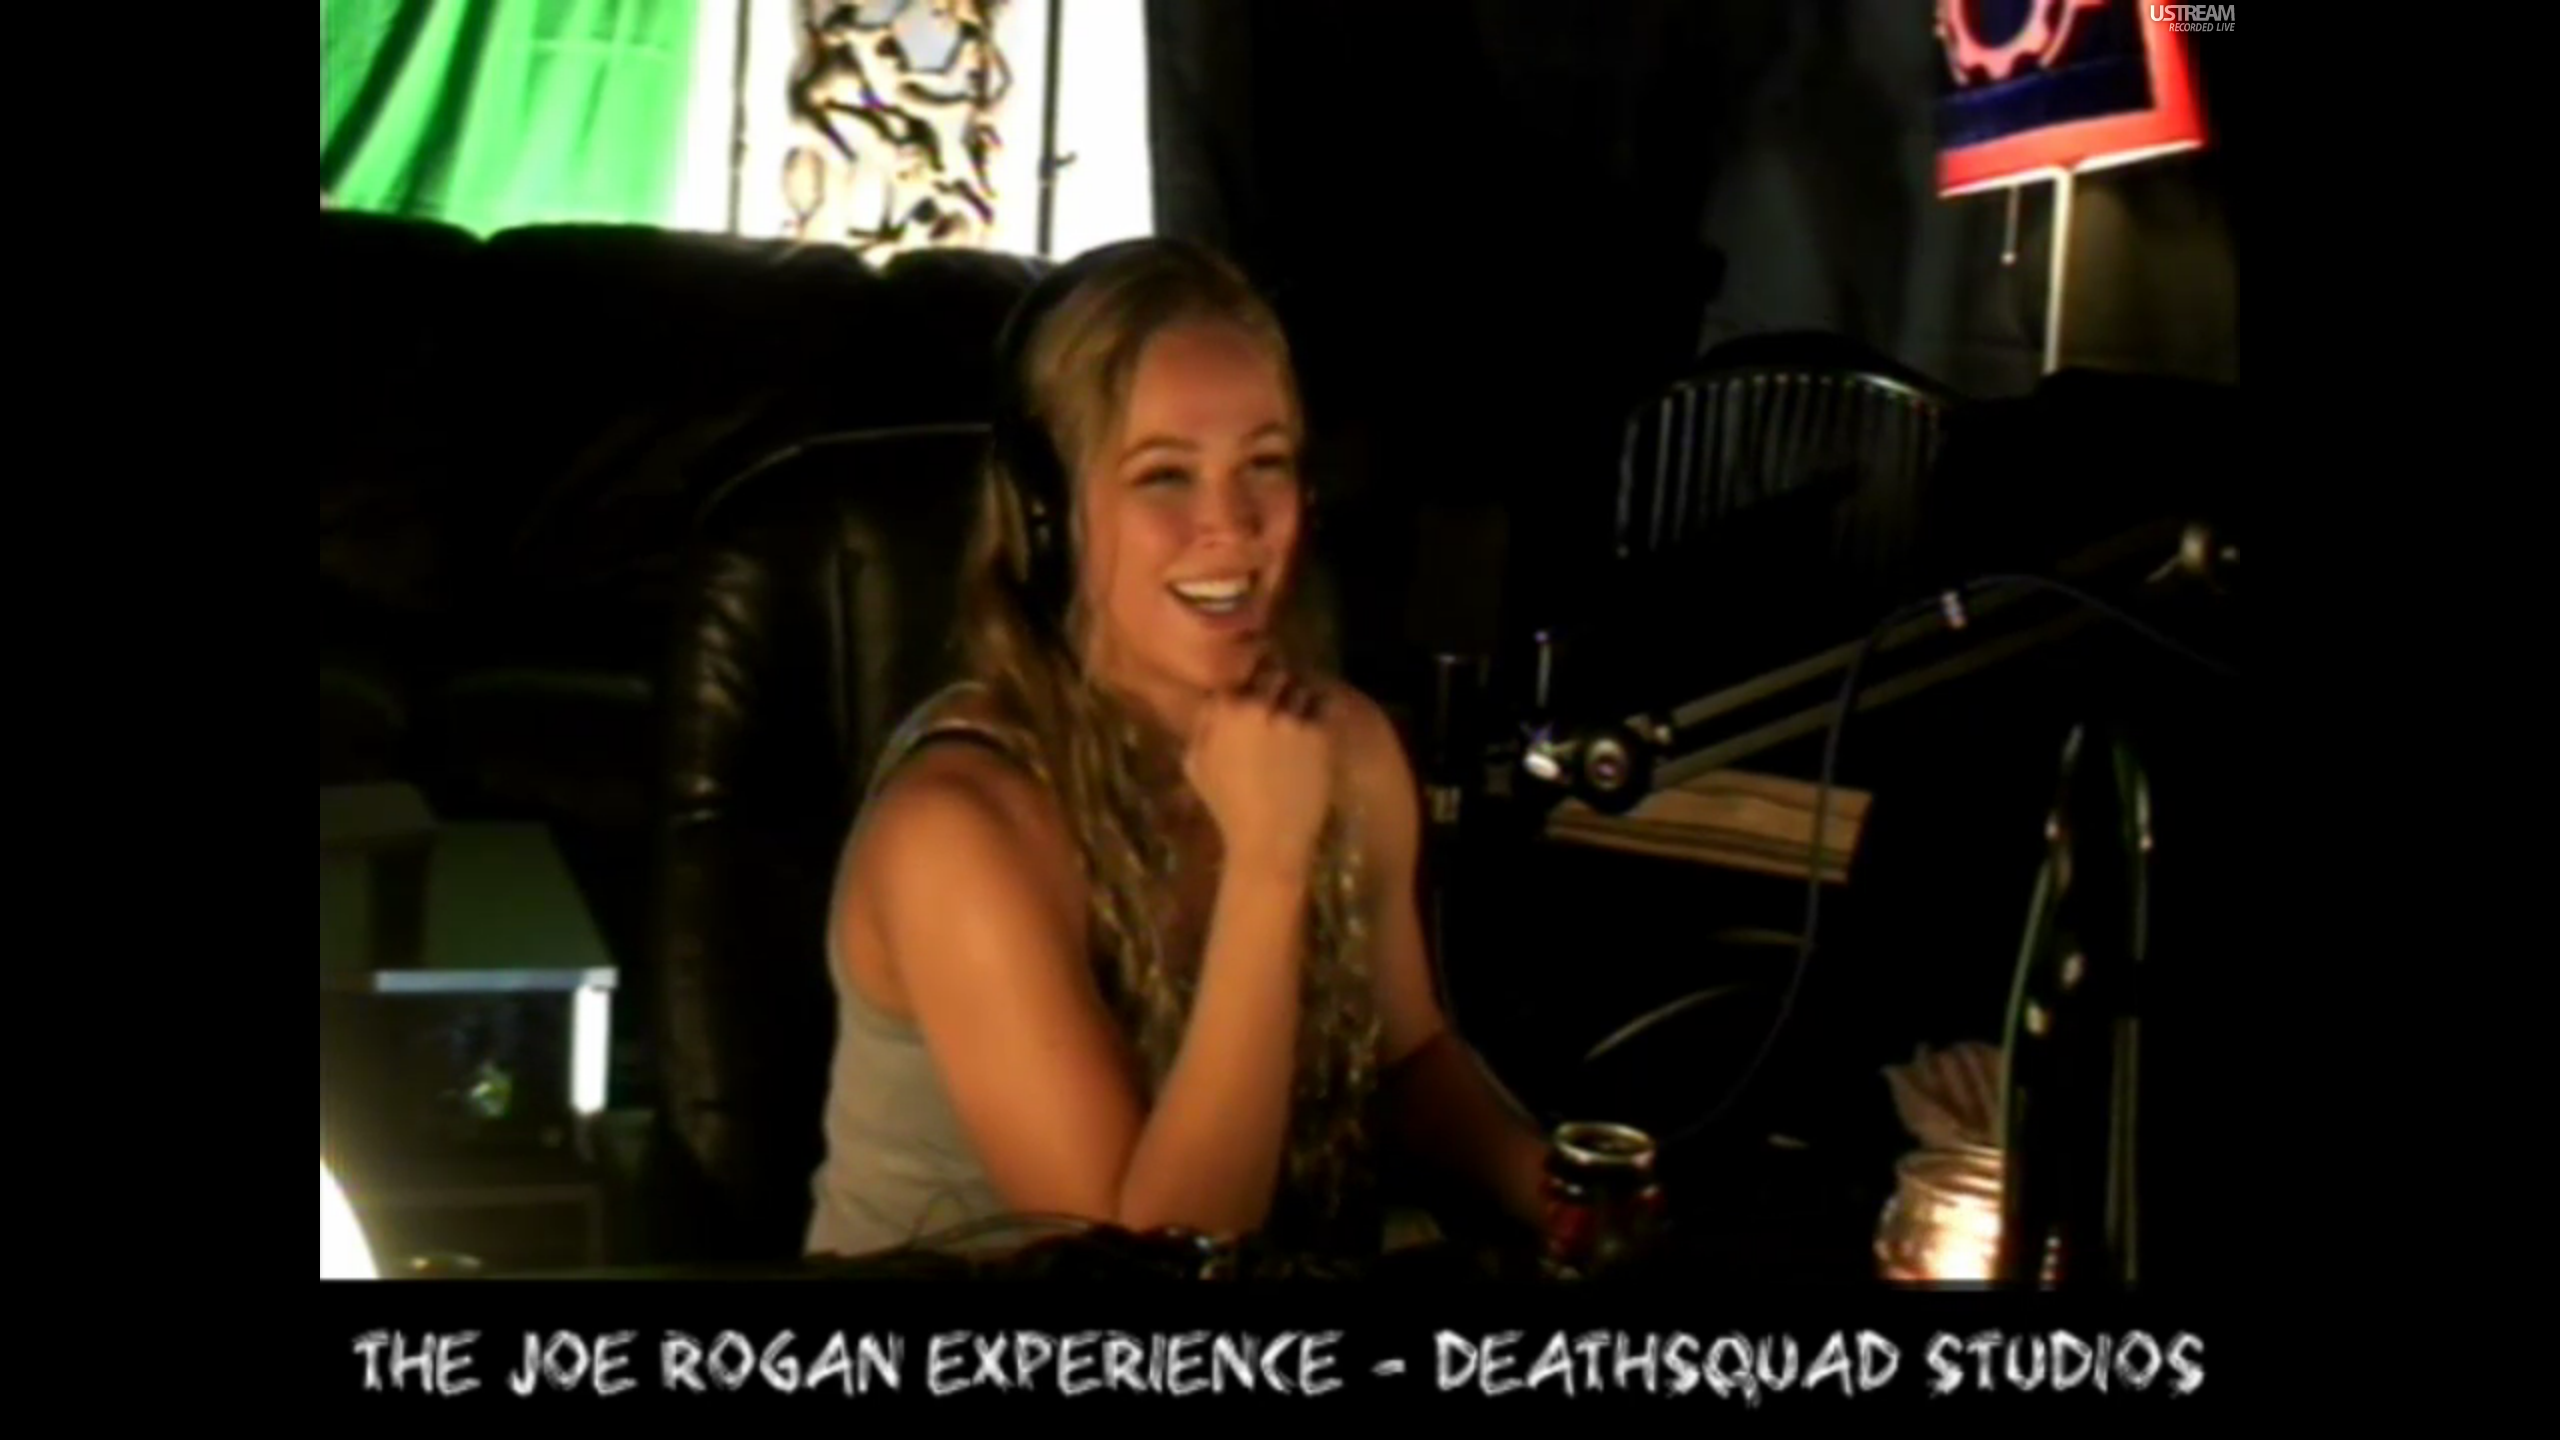 The Joe Rogan Experience PODCAST #168 - Ronda Rousey, Eddie Bravo, Brian Redban